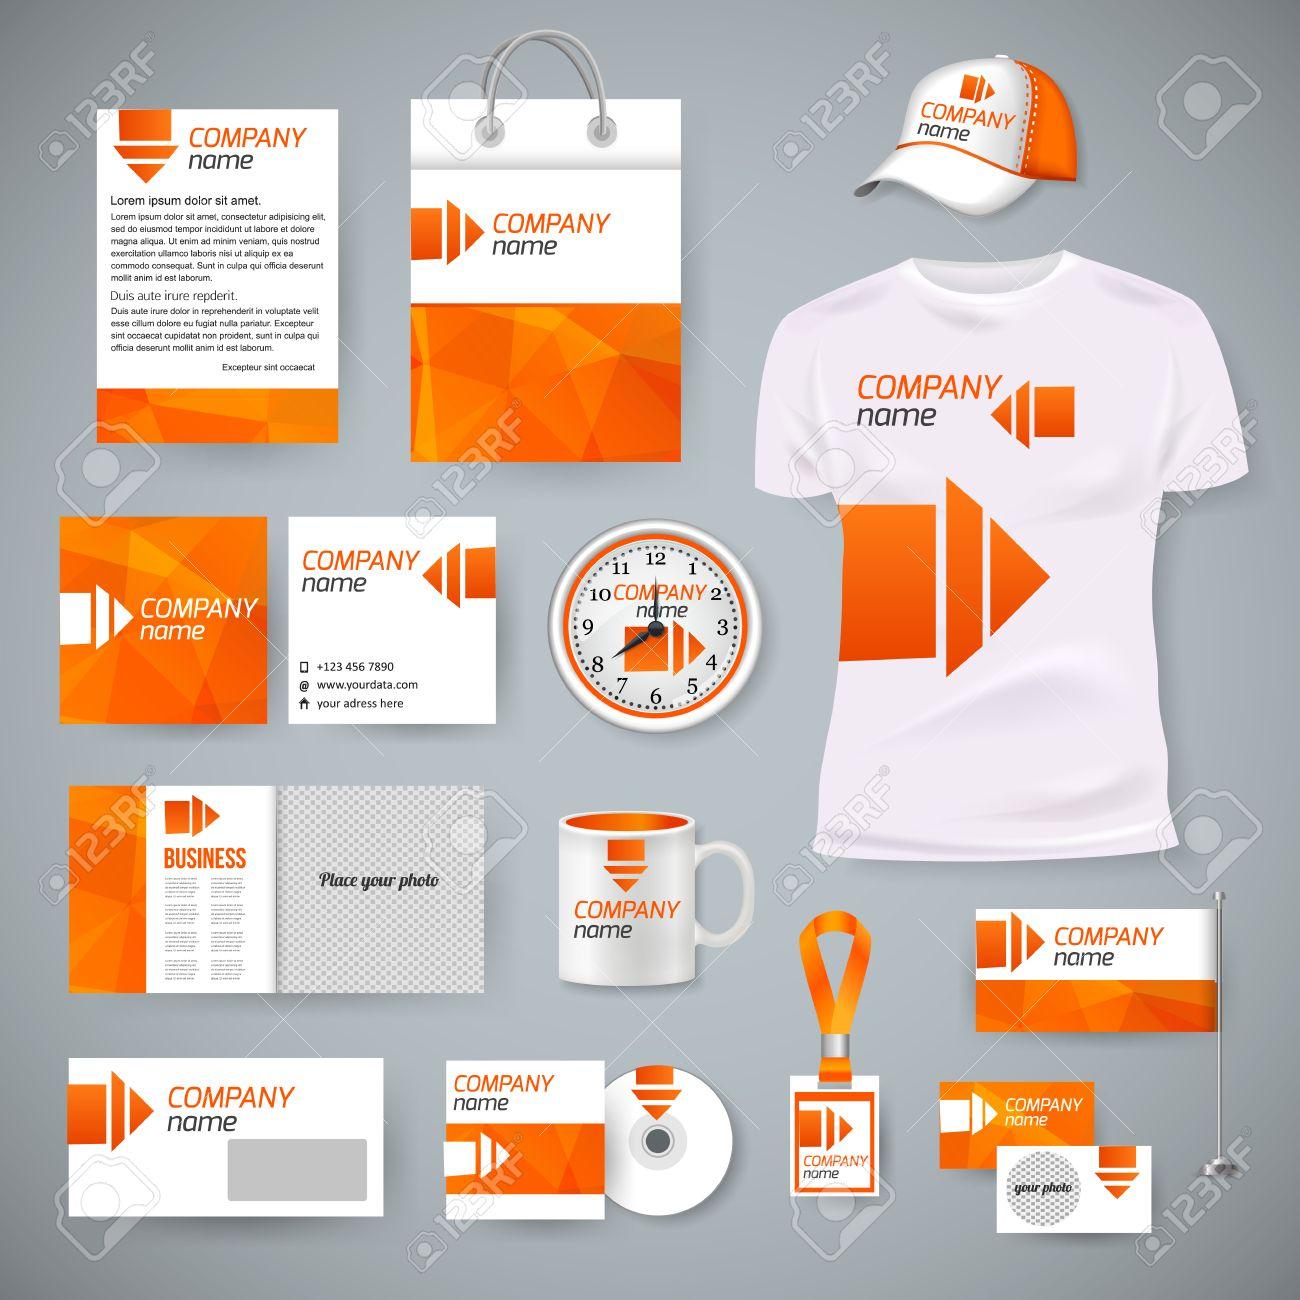 Corporate Identity Business Photorealistic Design Template Classic